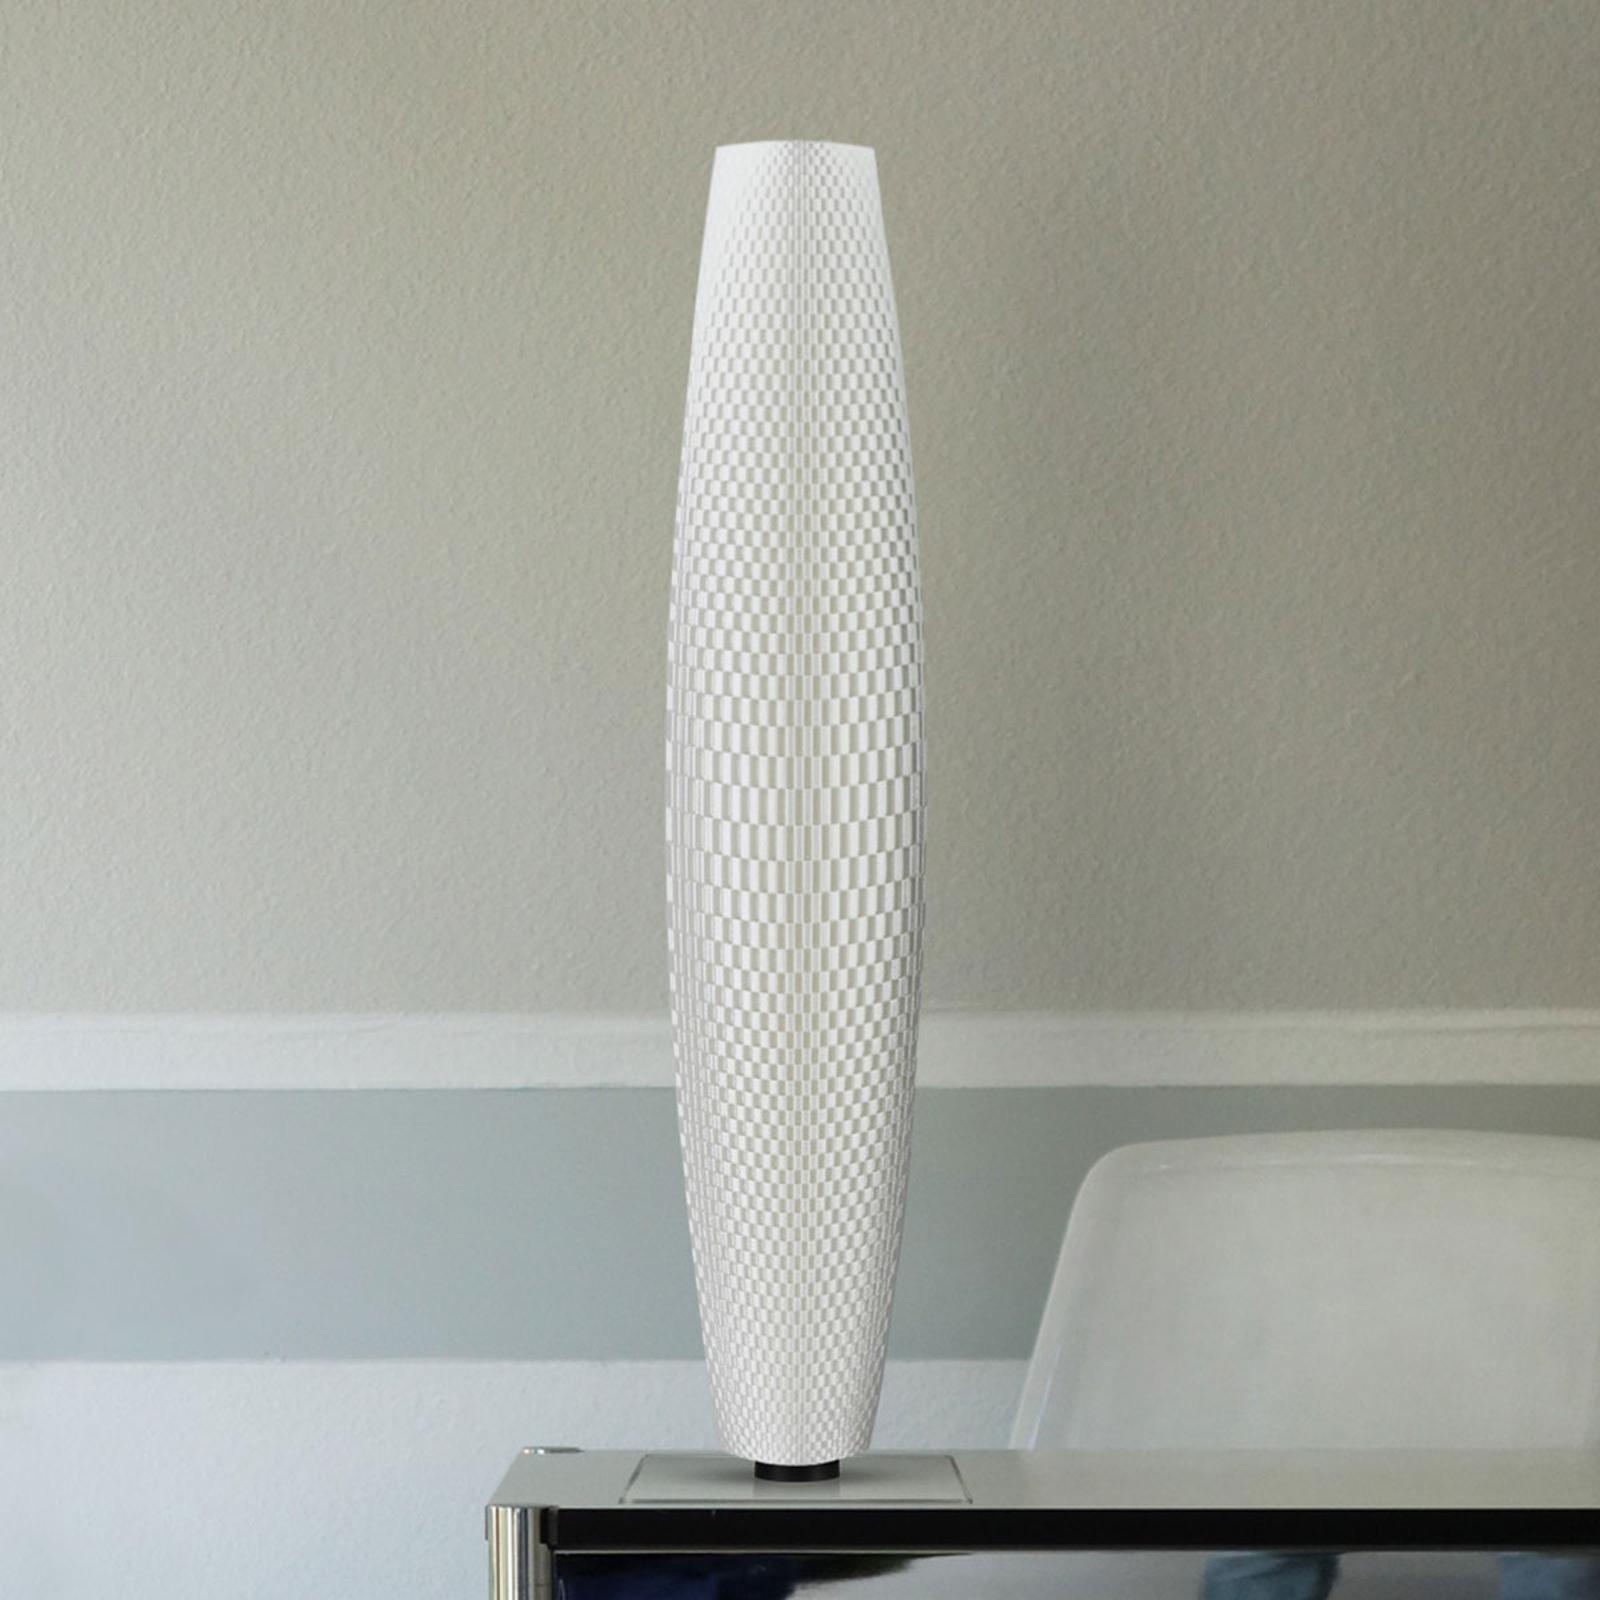 LED-lattiavalaisin Punos Pur, 75 RGB 75 cm